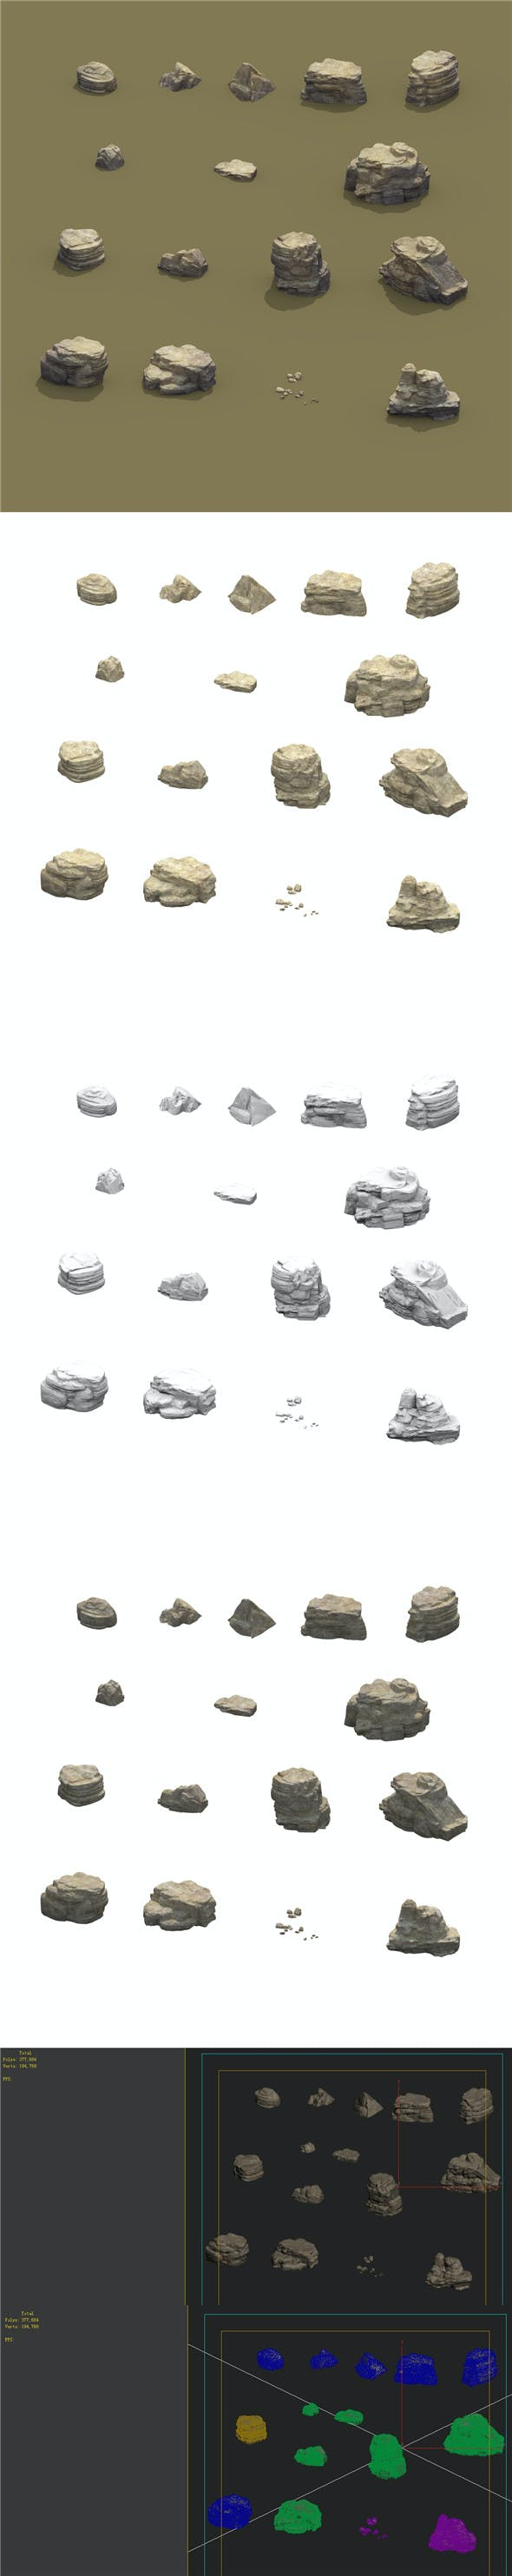 Mountain - Terrain 11 - 3DOcean Item for Sale